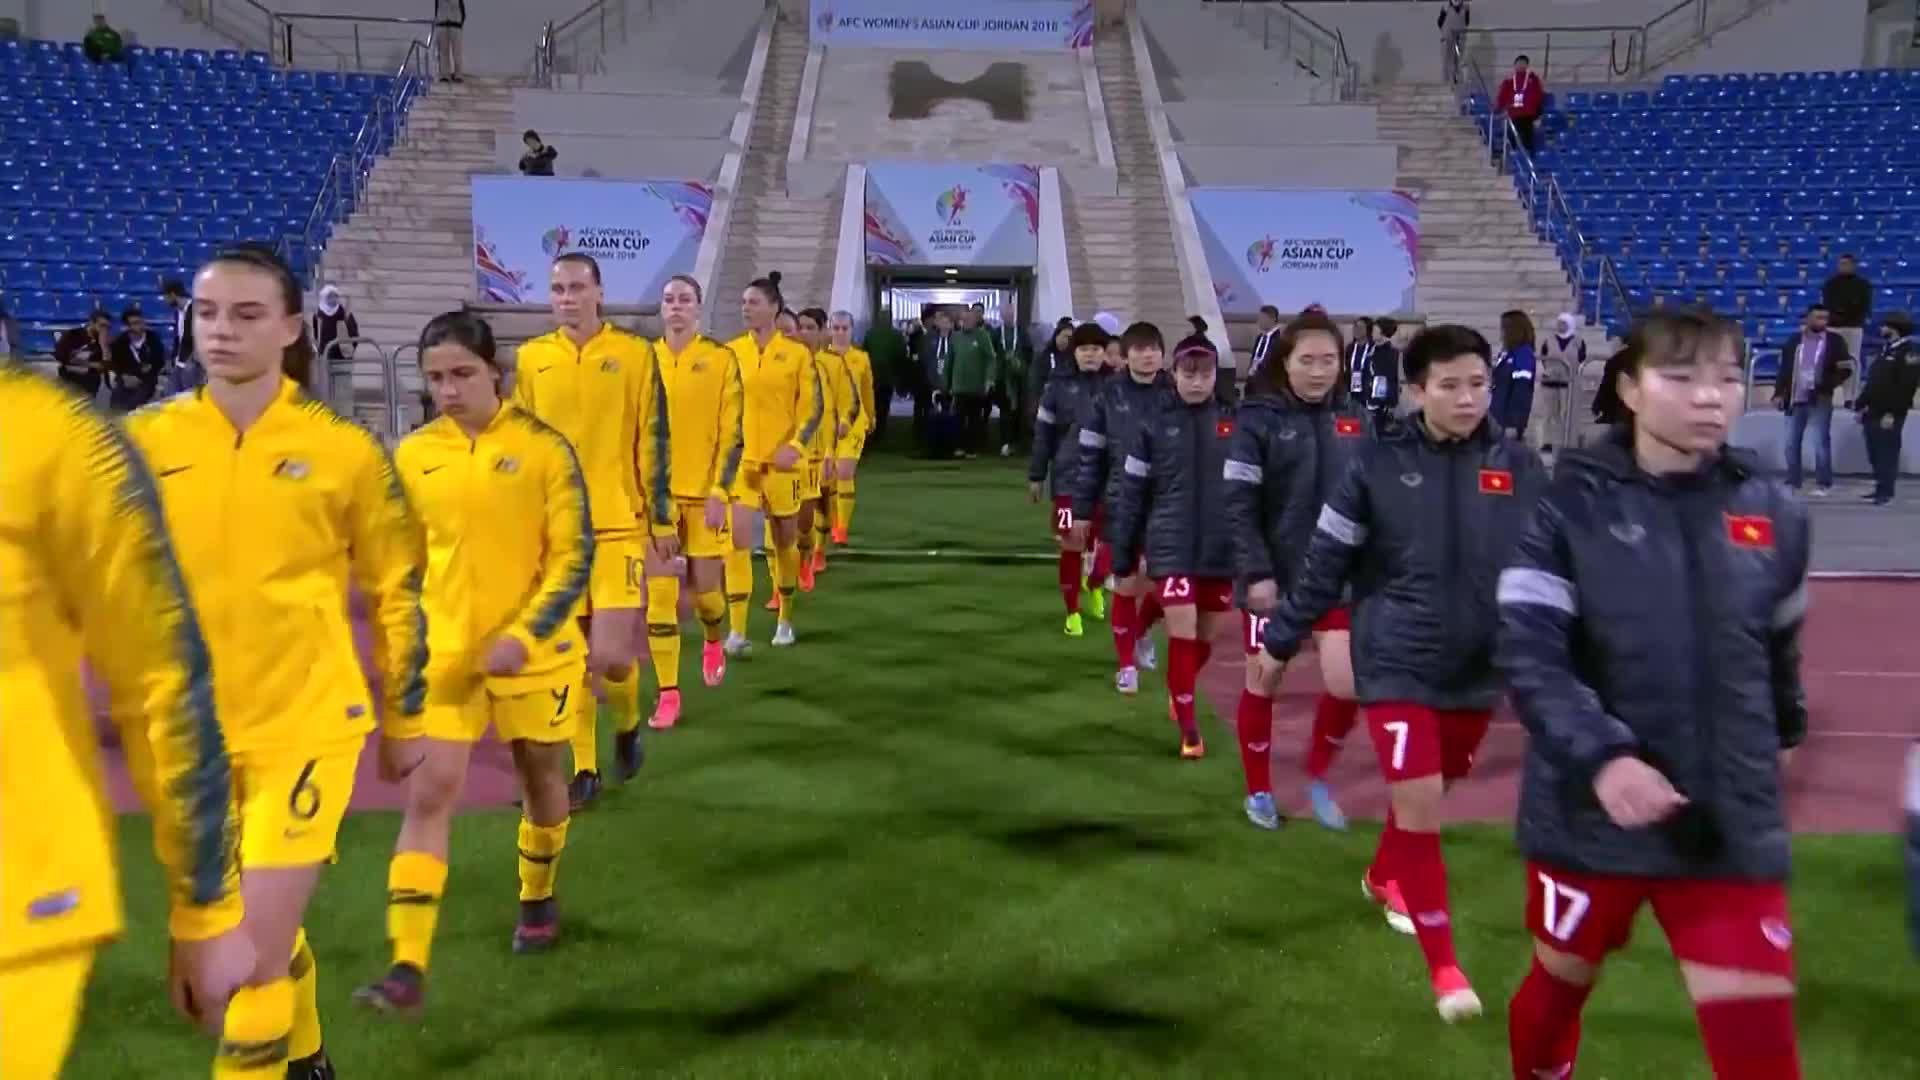 Vòng bảng Asian Cup nữ 2018: Việt Nam 0-8 Australia